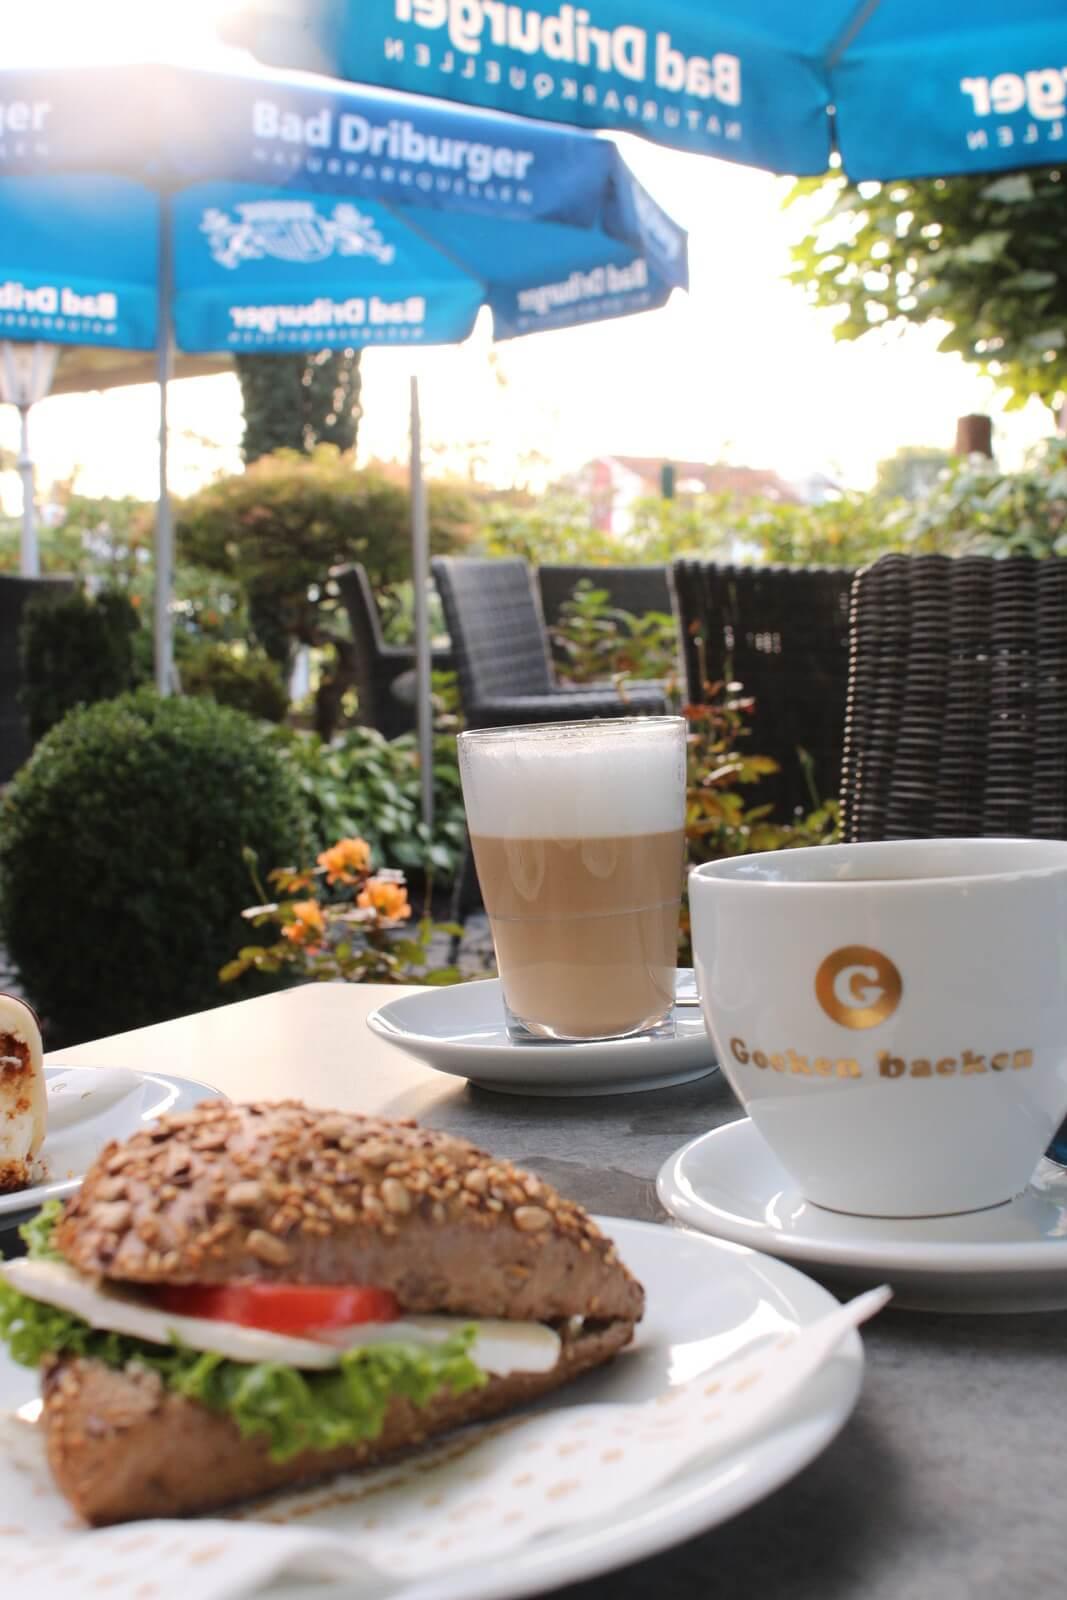 Frühstück in Paderborn